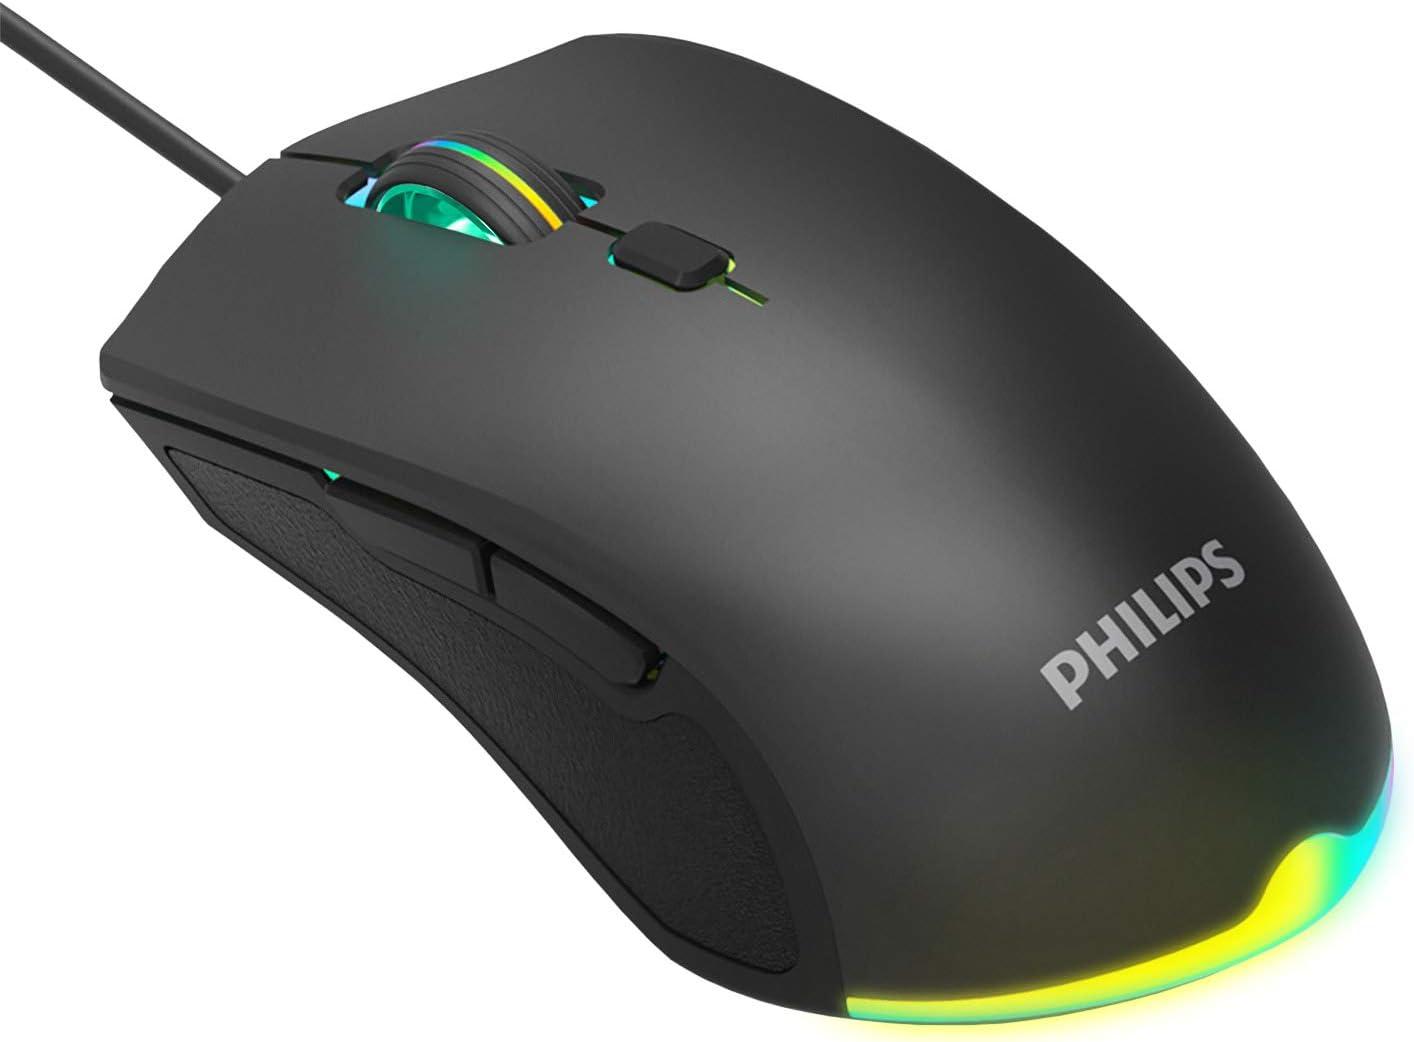 Philips Gaming Mouse Wired RGB Chroma Backlit, 6 Programmable Buttons Ergonomic Design Adjustable DPI 7 Color Backlit for Laptop PC Gamer Computer Desktop